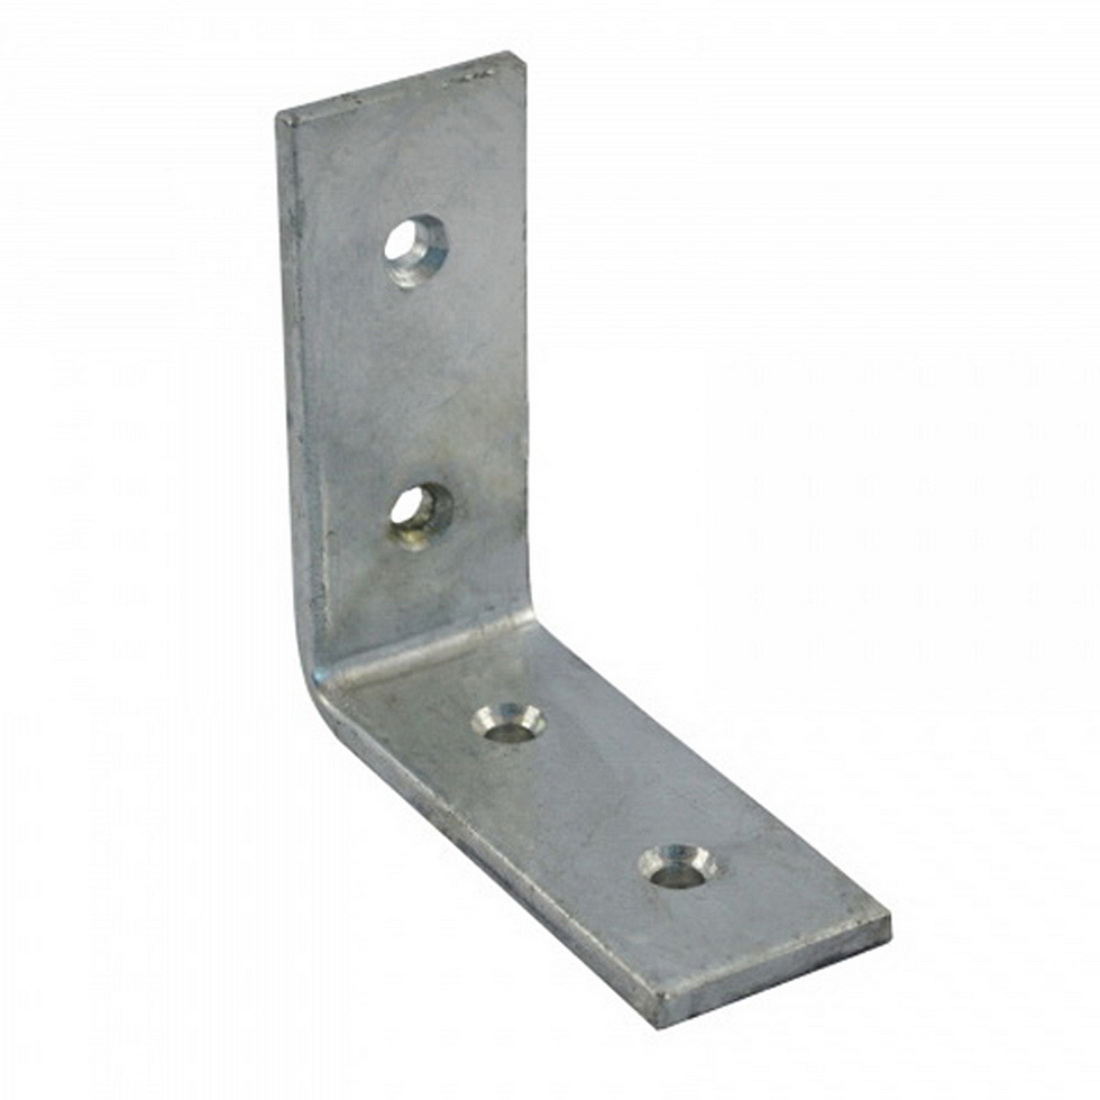 Heavy Duty Angle Bracket 50 x 50 x 40mm Zinc Plated BANHZ050E040R